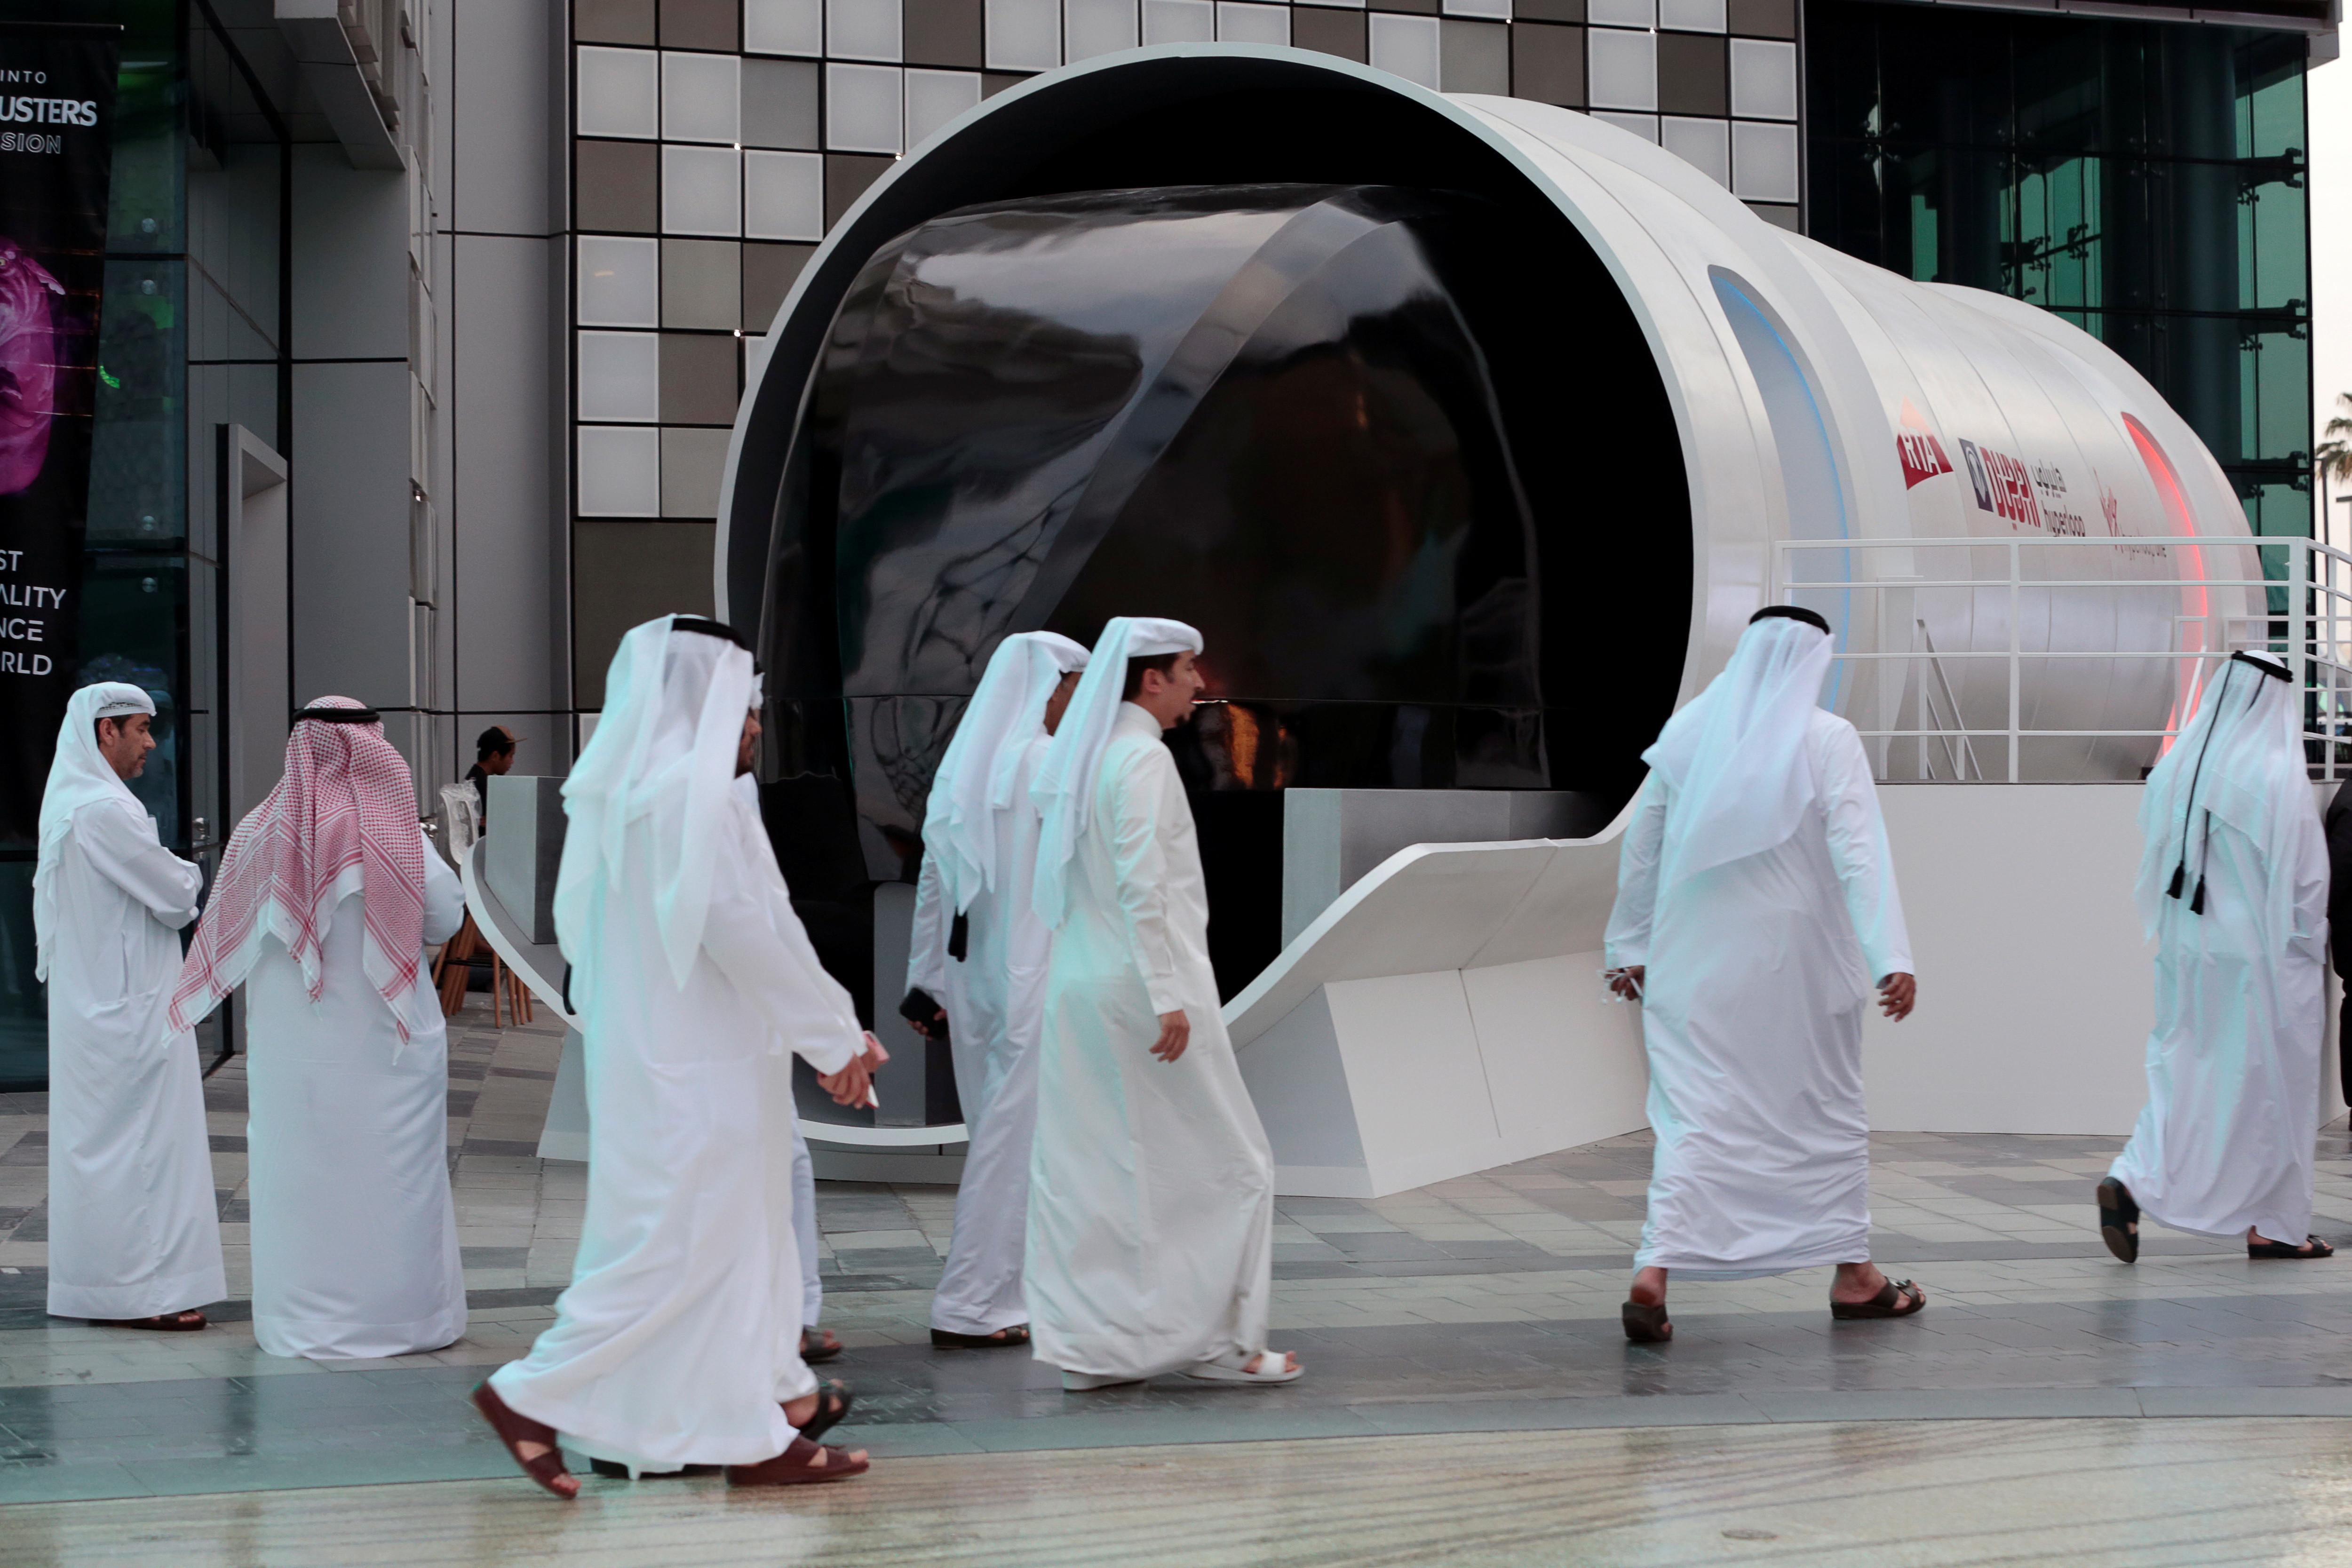 A hyperloop design model in Dubai.